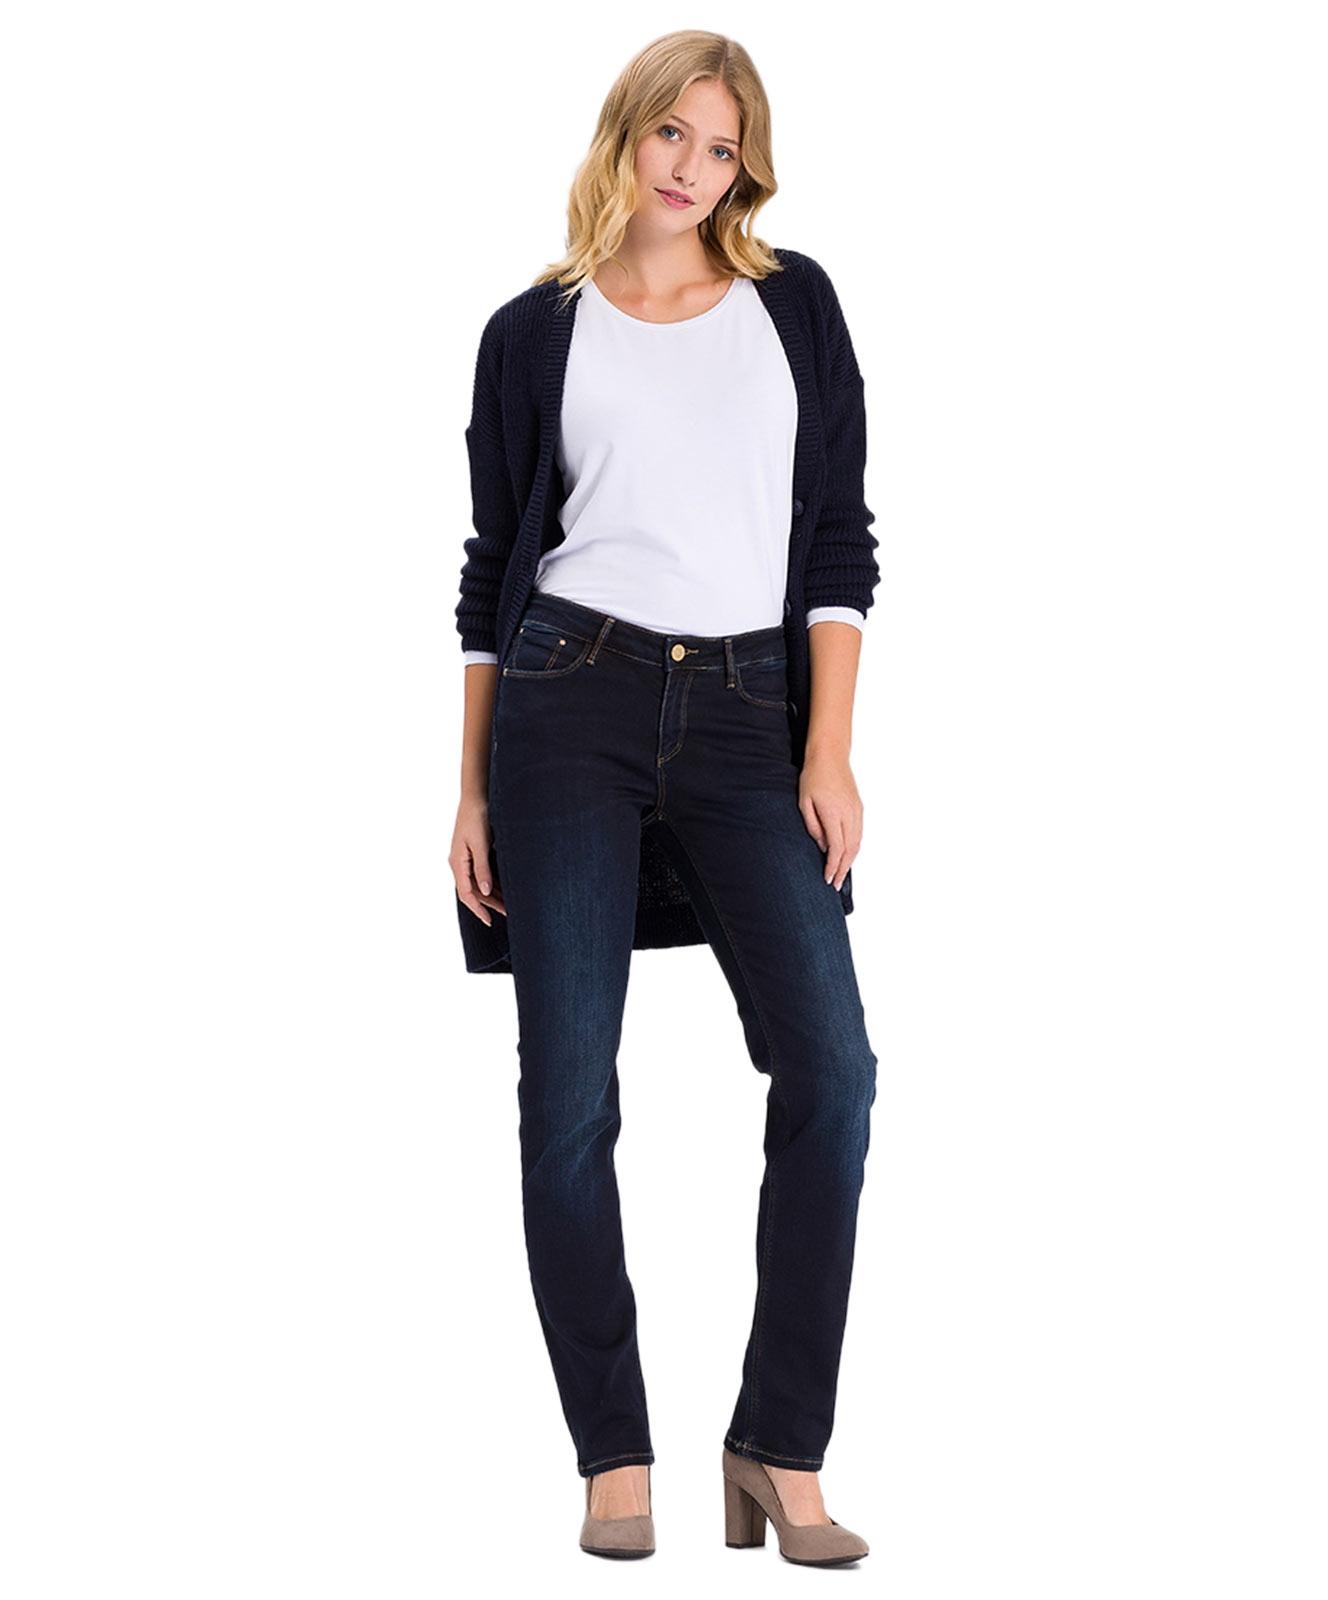 Hosen - Cross Straight Leg Jeans Rose in Blue Black Used  - Onlineshop Jeans Meile